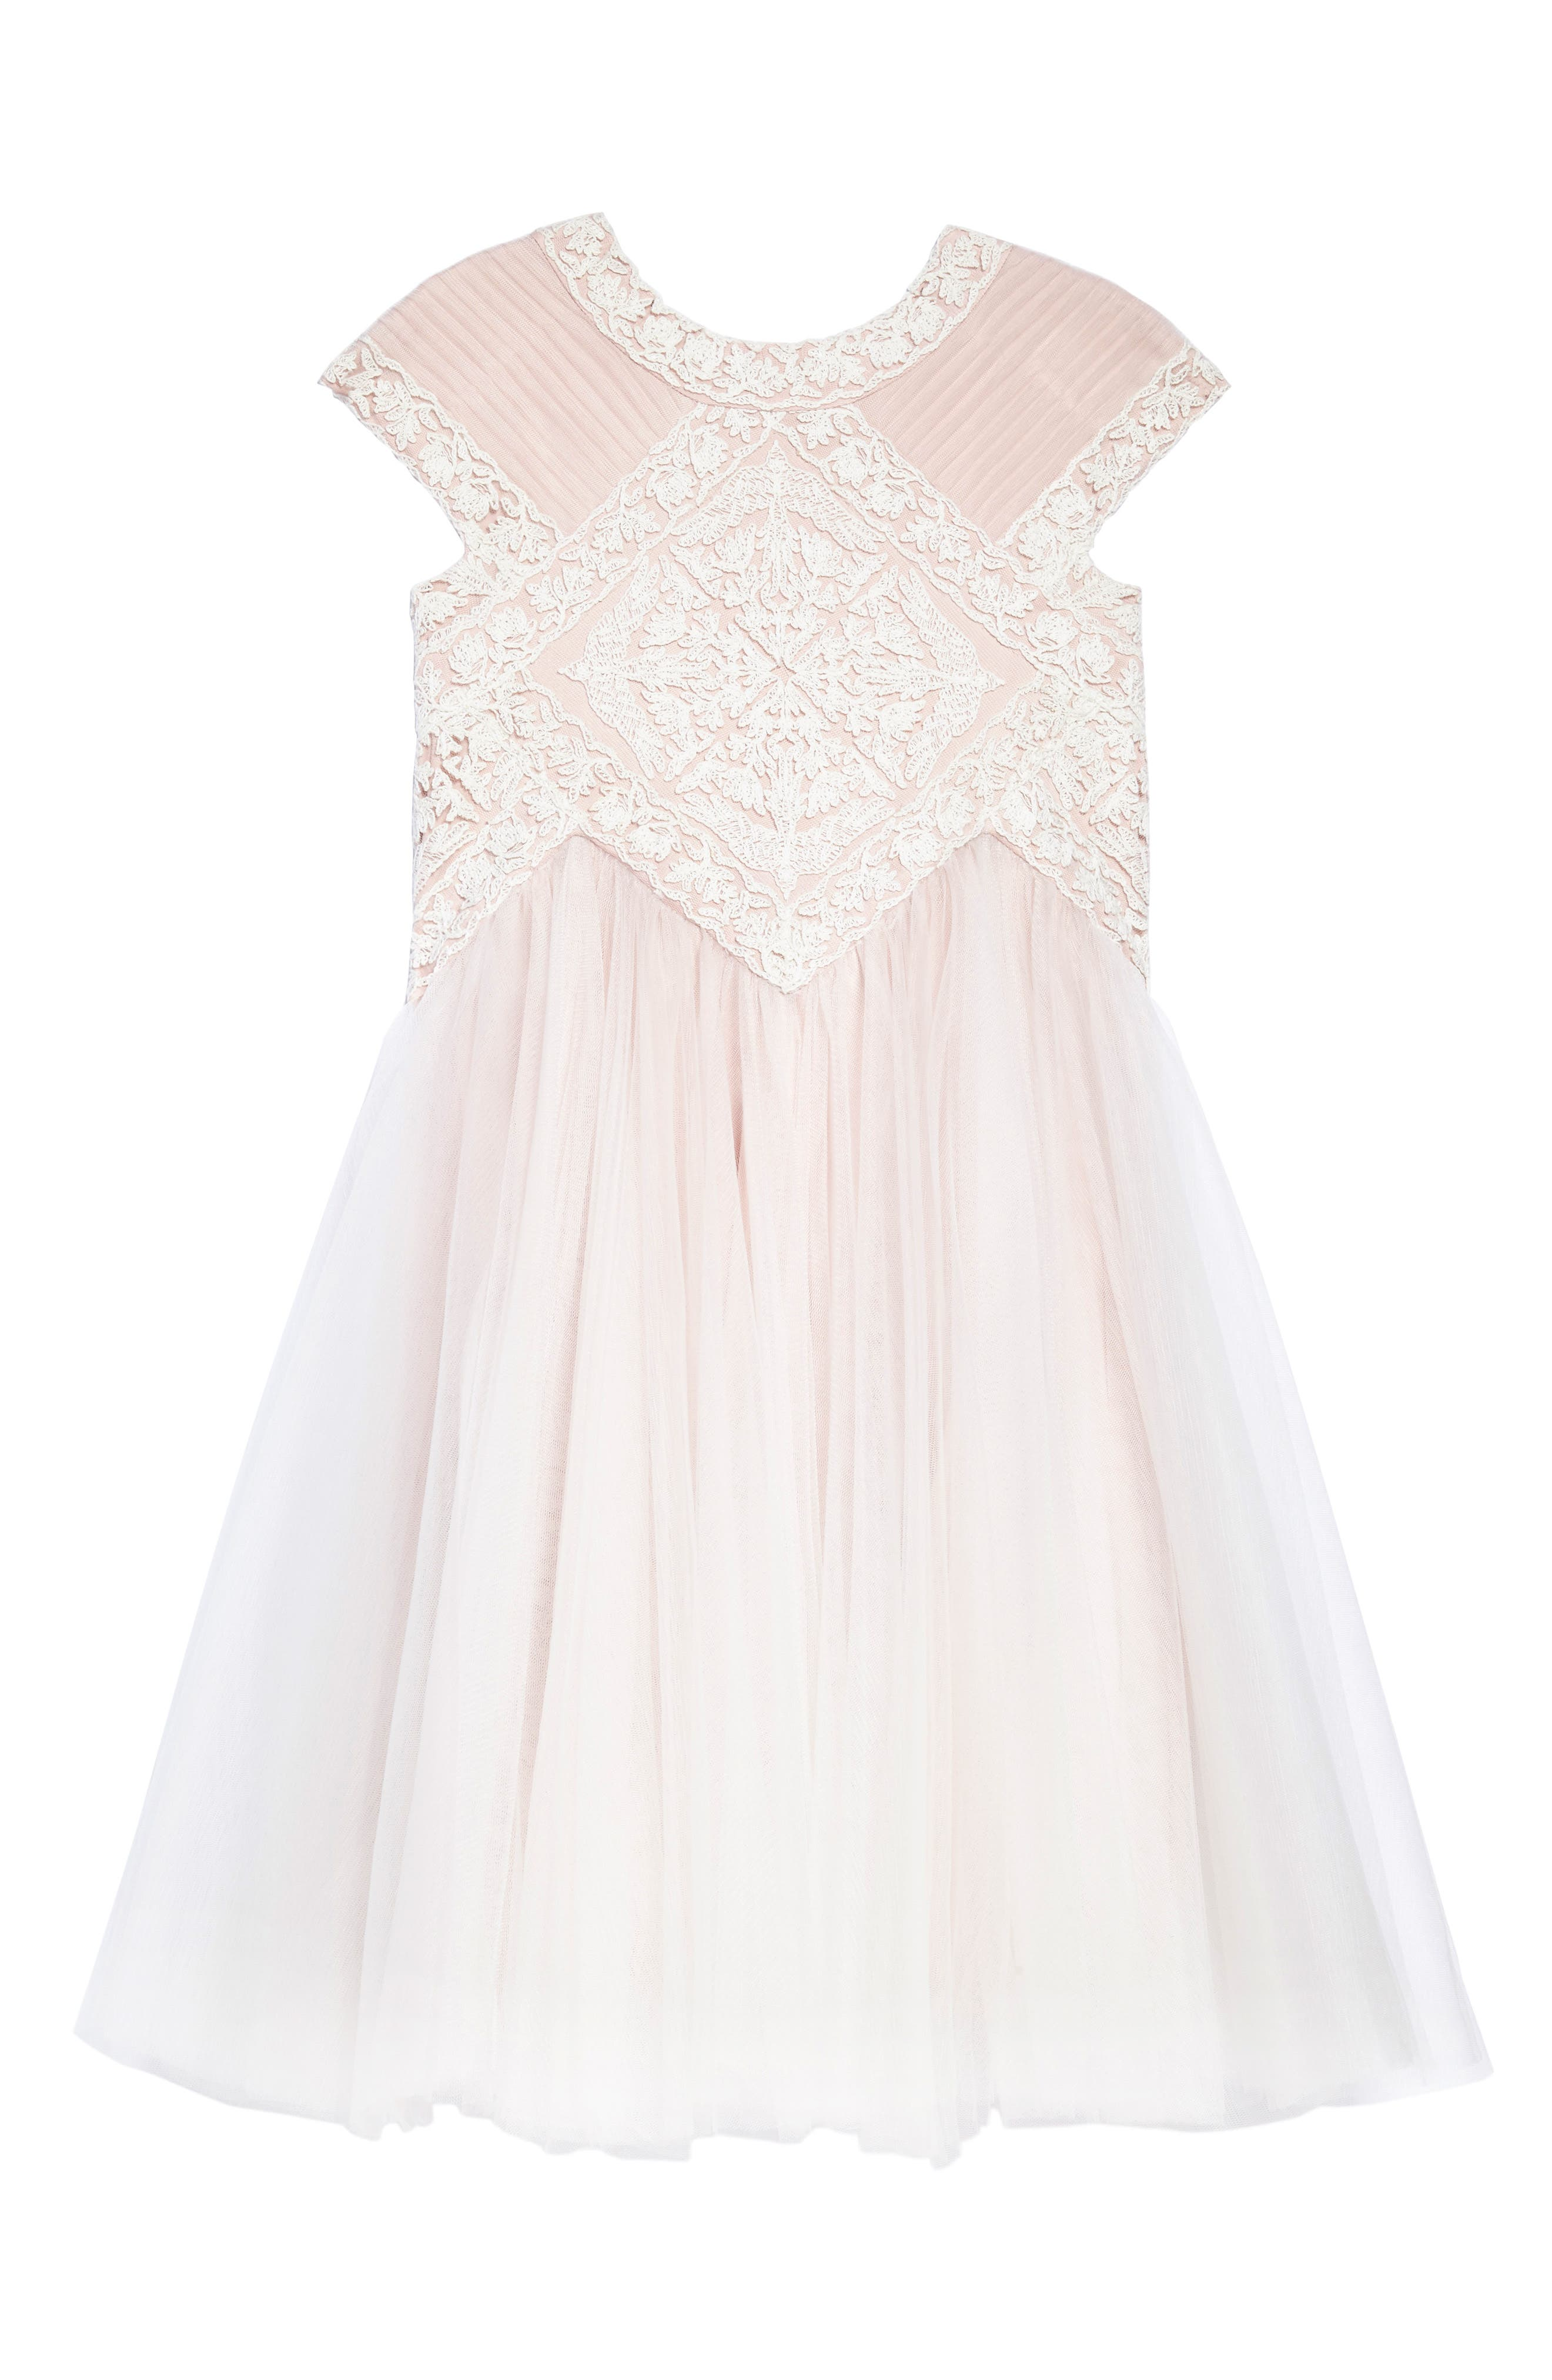 Lace Tulle Dress,                             Main thumbnail 1, color,                             Ivory/ Primrose